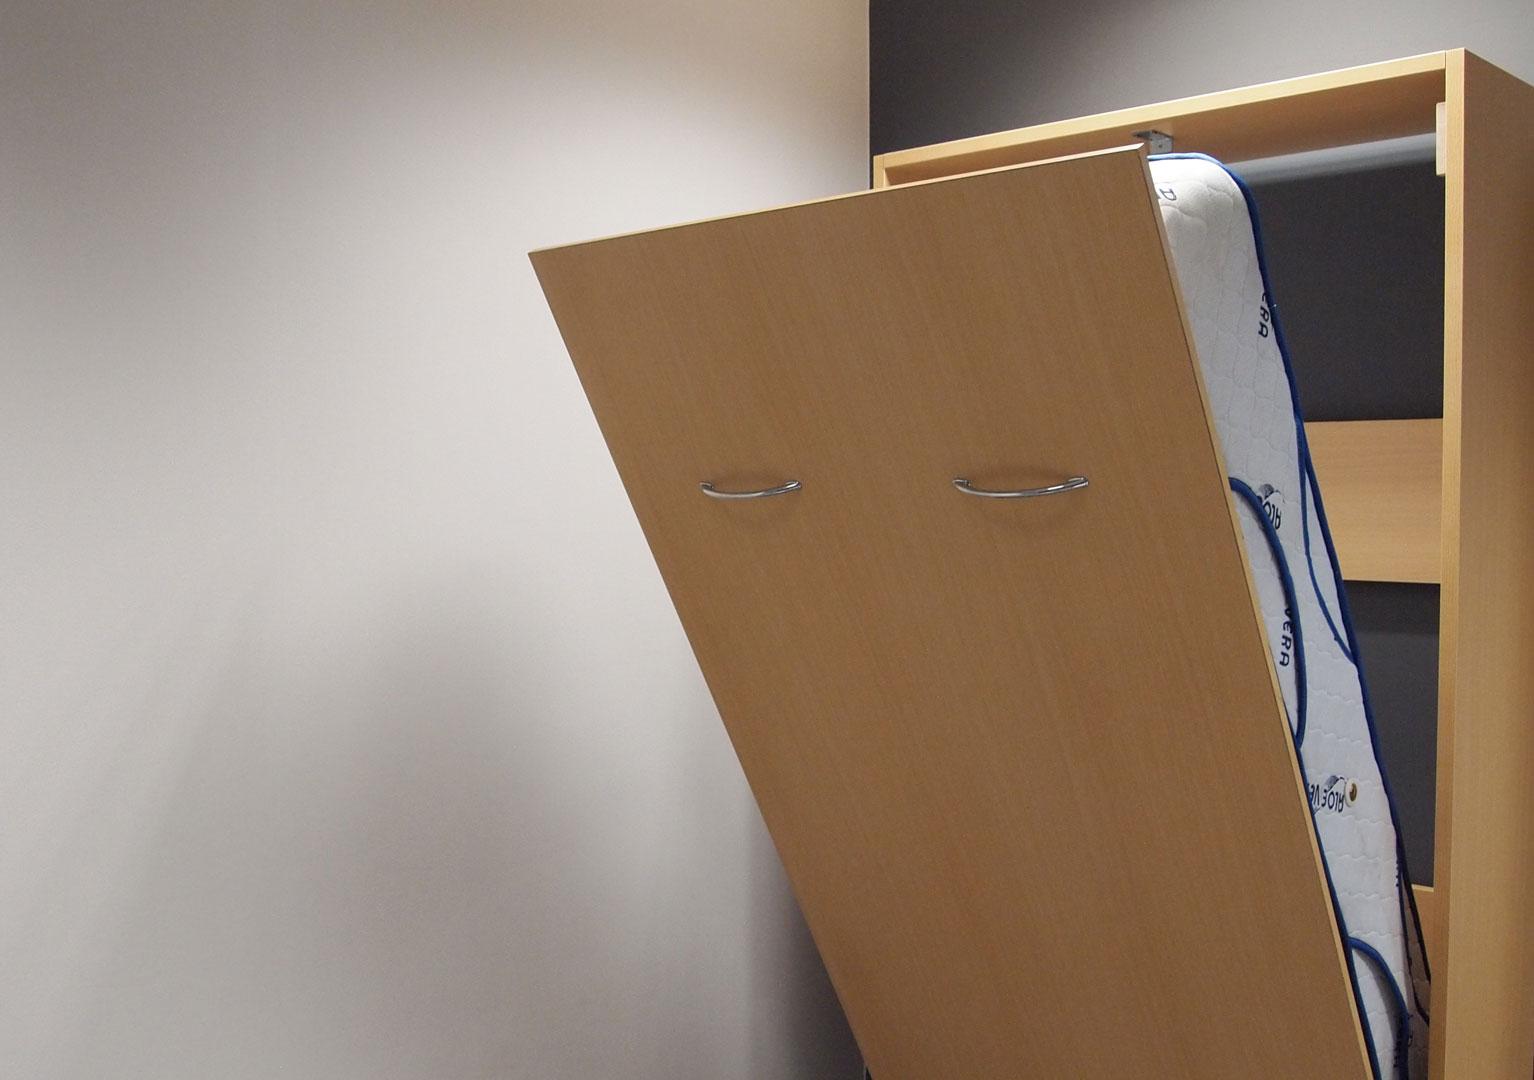 Camas abatibles online camas abatibles verticales para - Sistema cama abatible ...